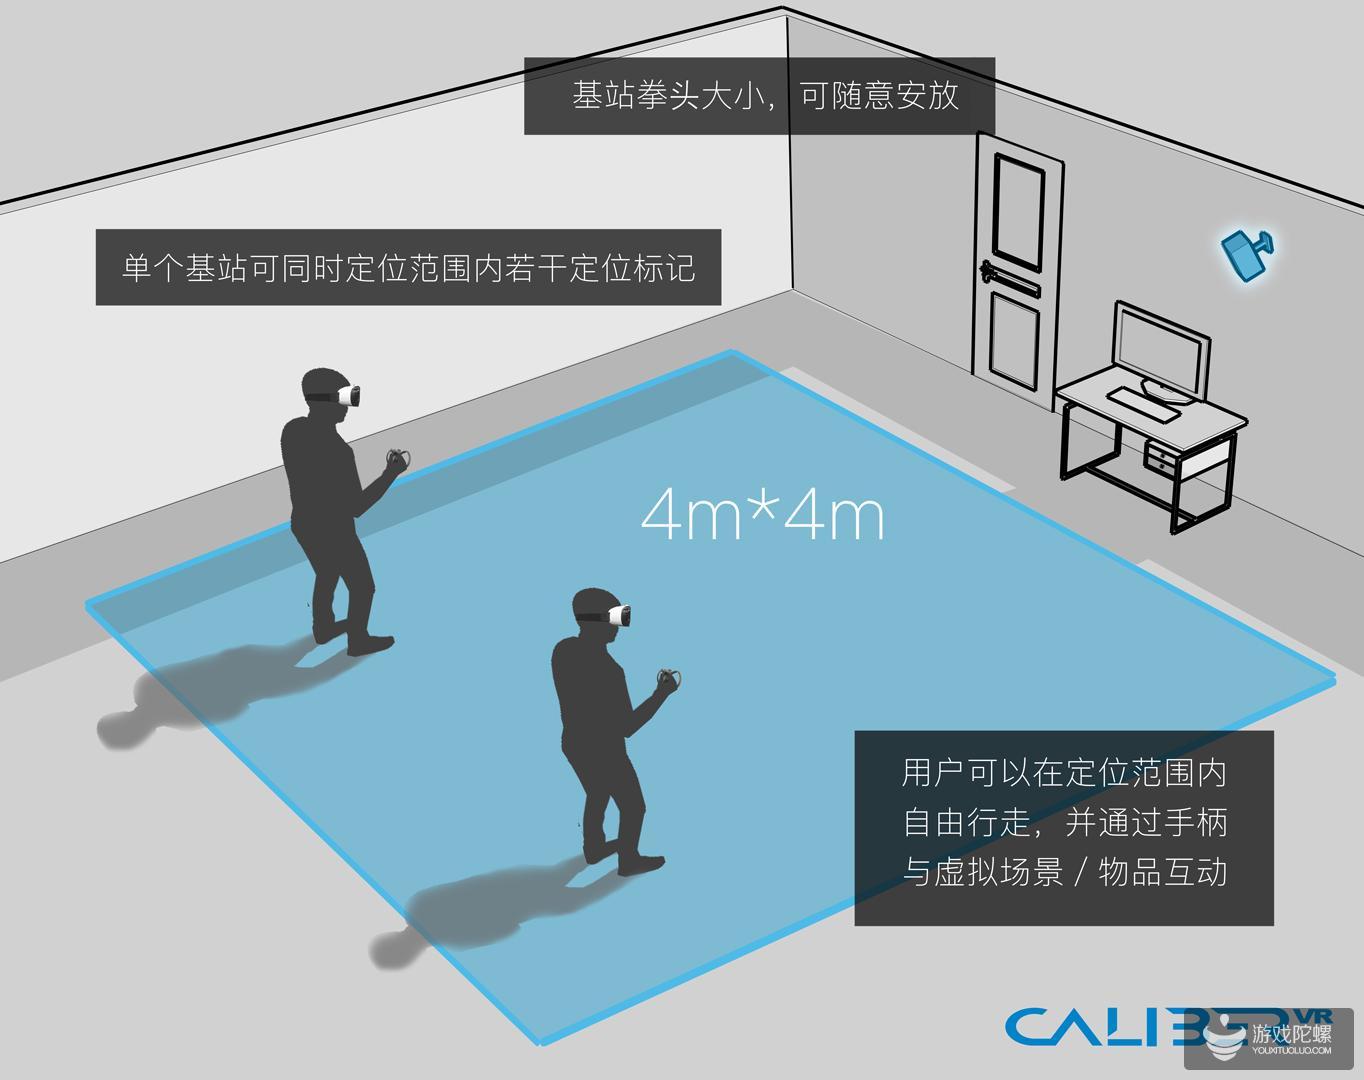 Caliber VR用几百块让移动VR真的动起来